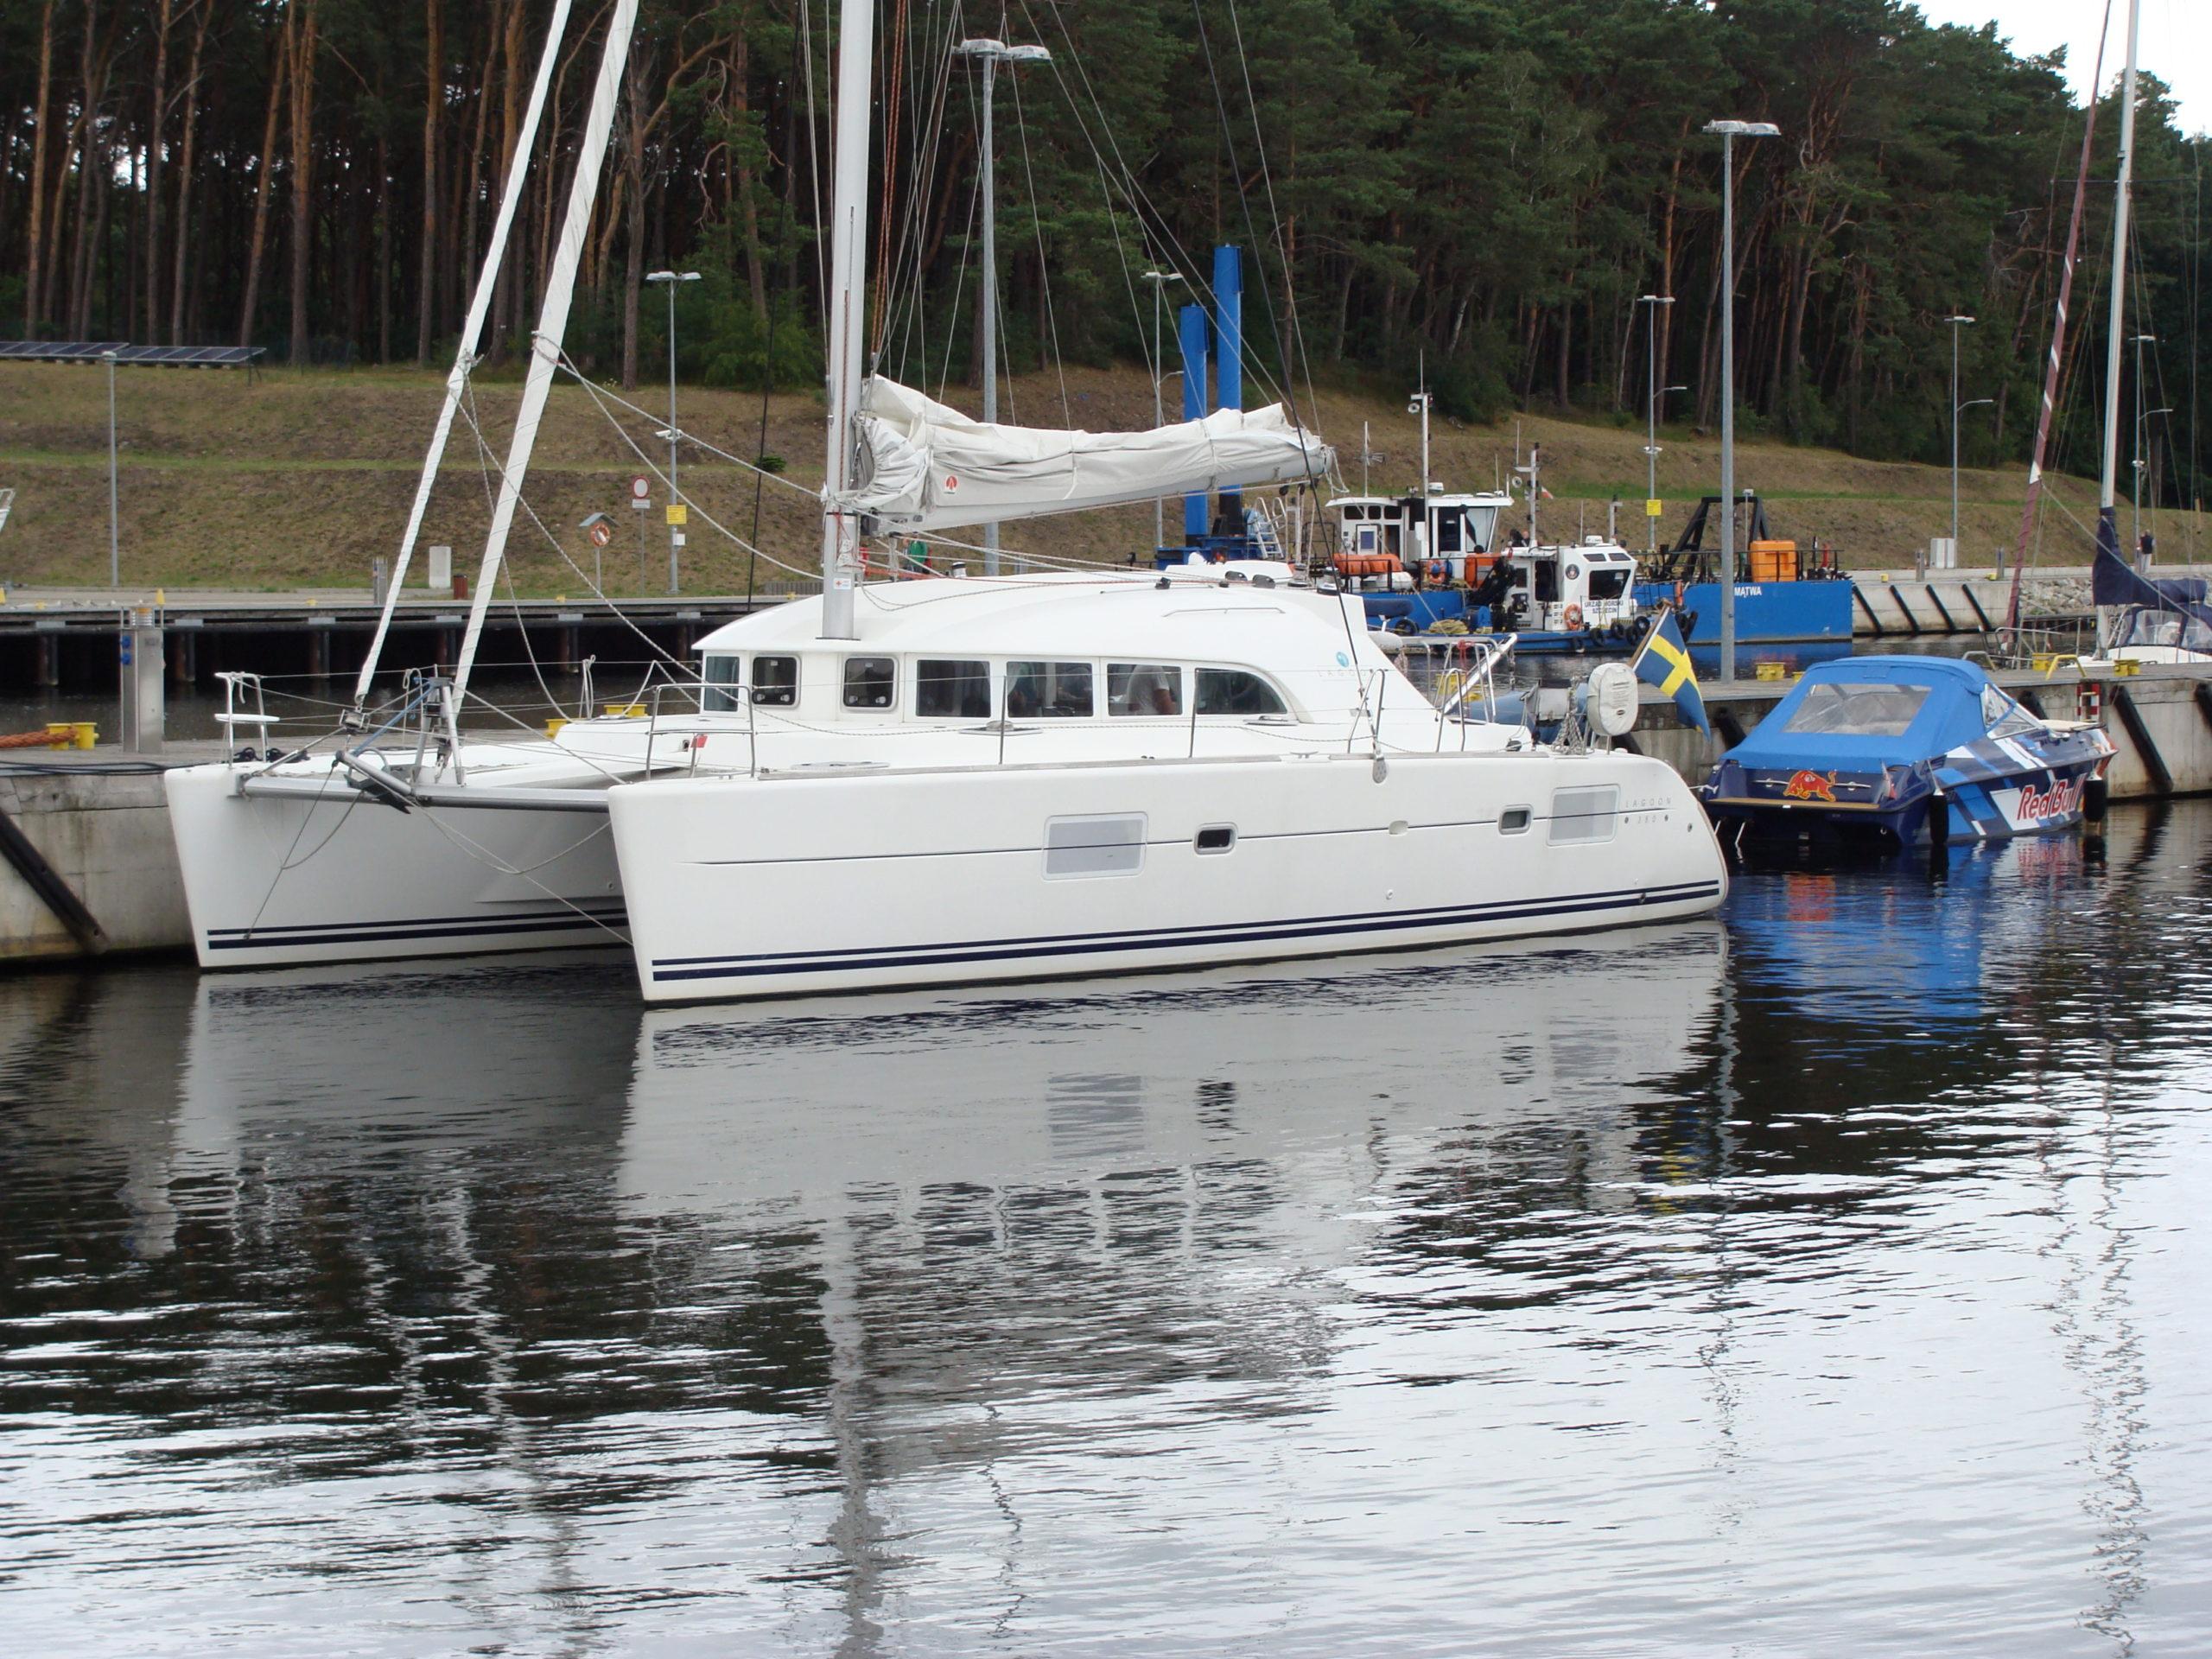 Jacht morski 20